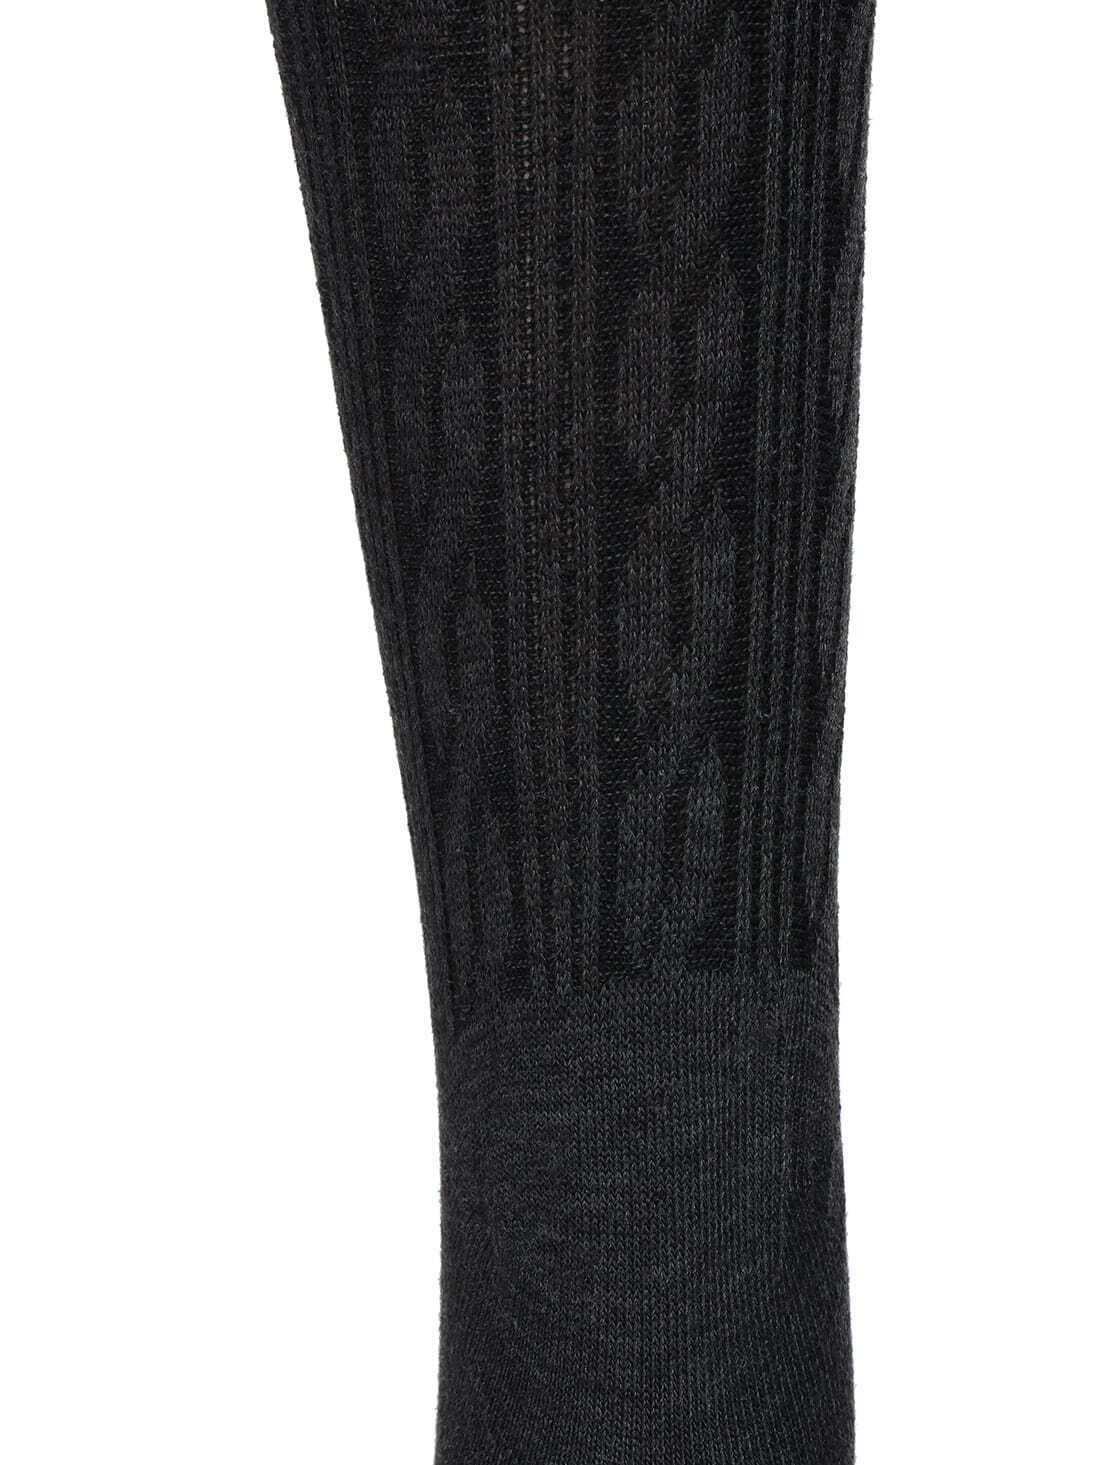 strumpfhosen mit geripptem muster dunkel grau german. Black Bedroom Furniture Sets. Home Design Ideas